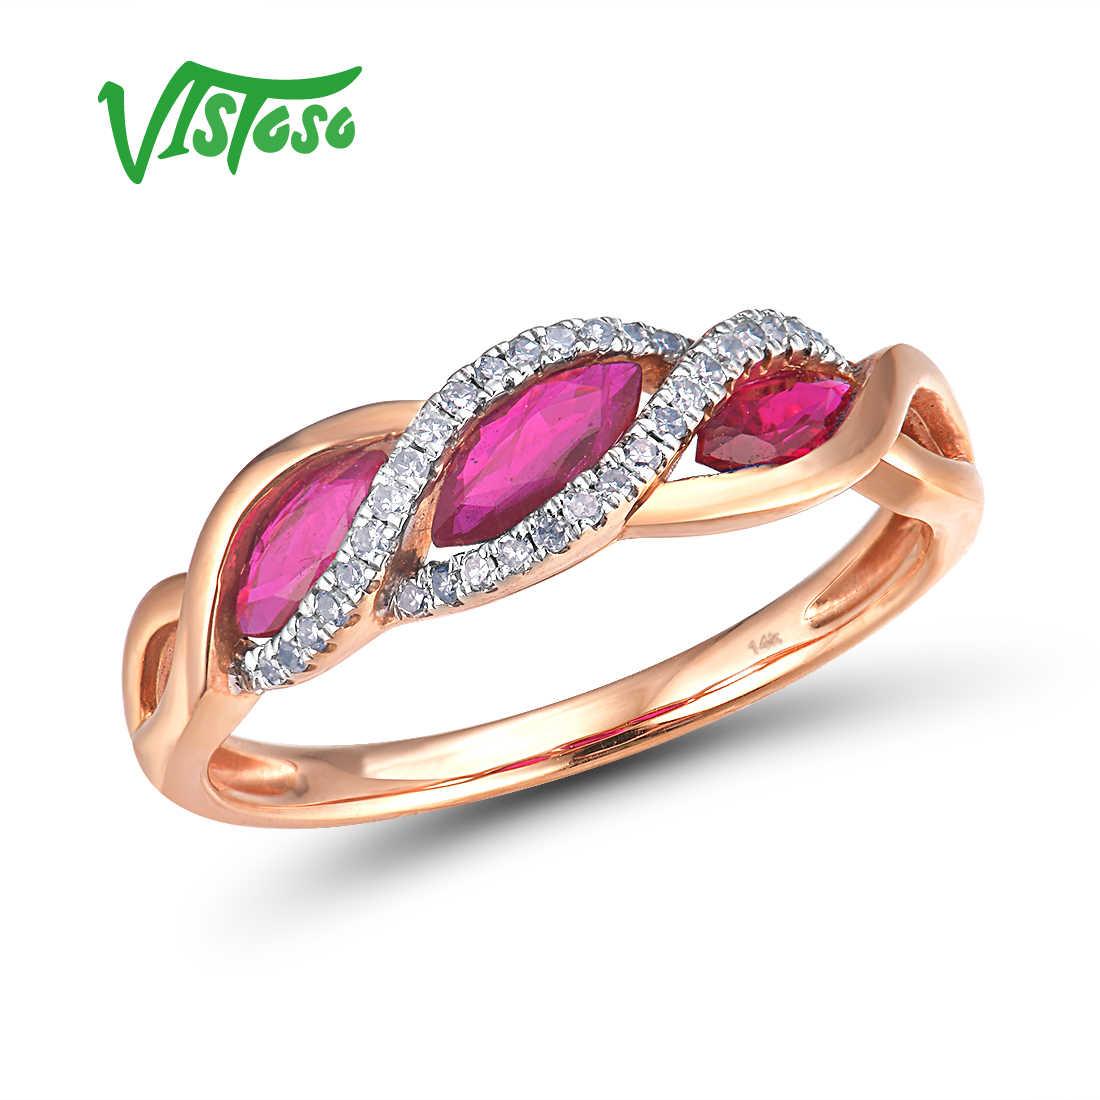 VISTOSO ของแท้ 14K585 Rose Gold แฟนซีทับทิมเงาแหวนเพชรสำหรับสุภาพสตรีงานแต่งงาน Anniverary อินเทรนด์หรูหราเครื่องประดับ